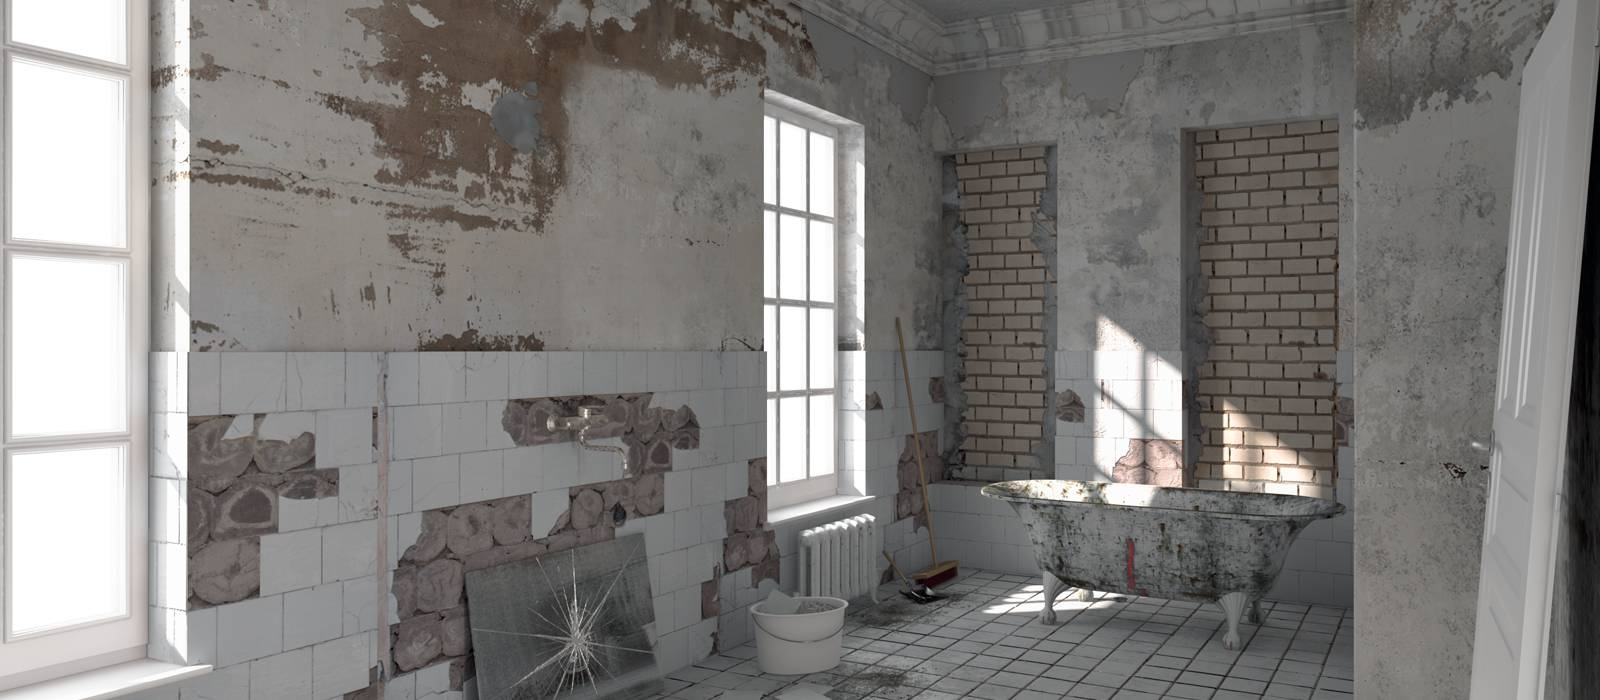 ¿Te apetece un baño nuevo?